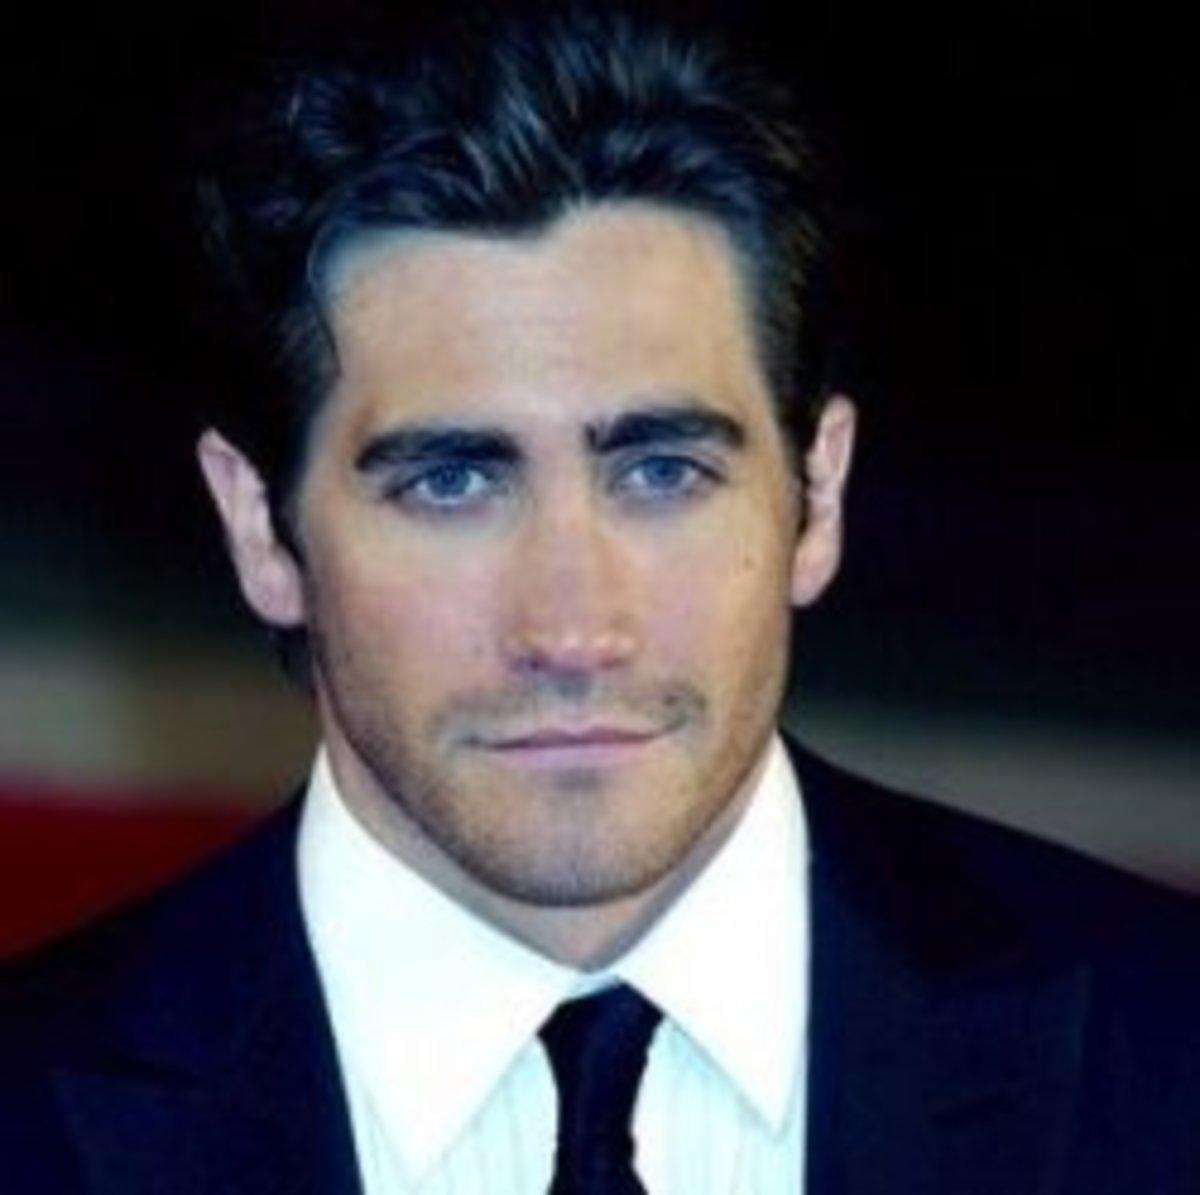 Ten Best Jake Gyllenhaal Movies